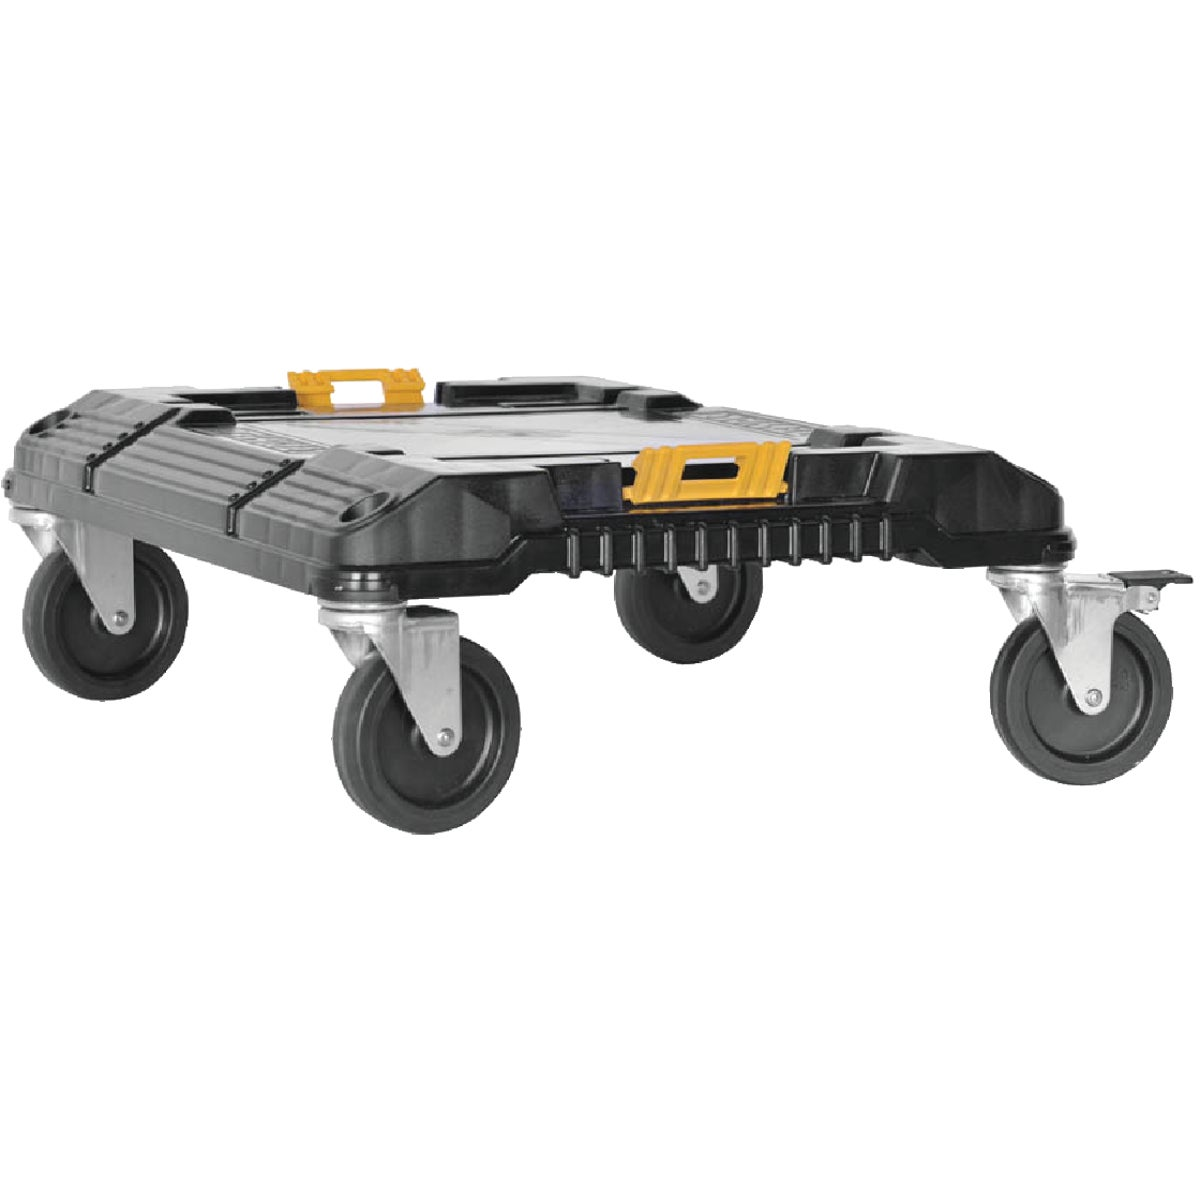 Dewalt TSTAK Carrier Tool Cart